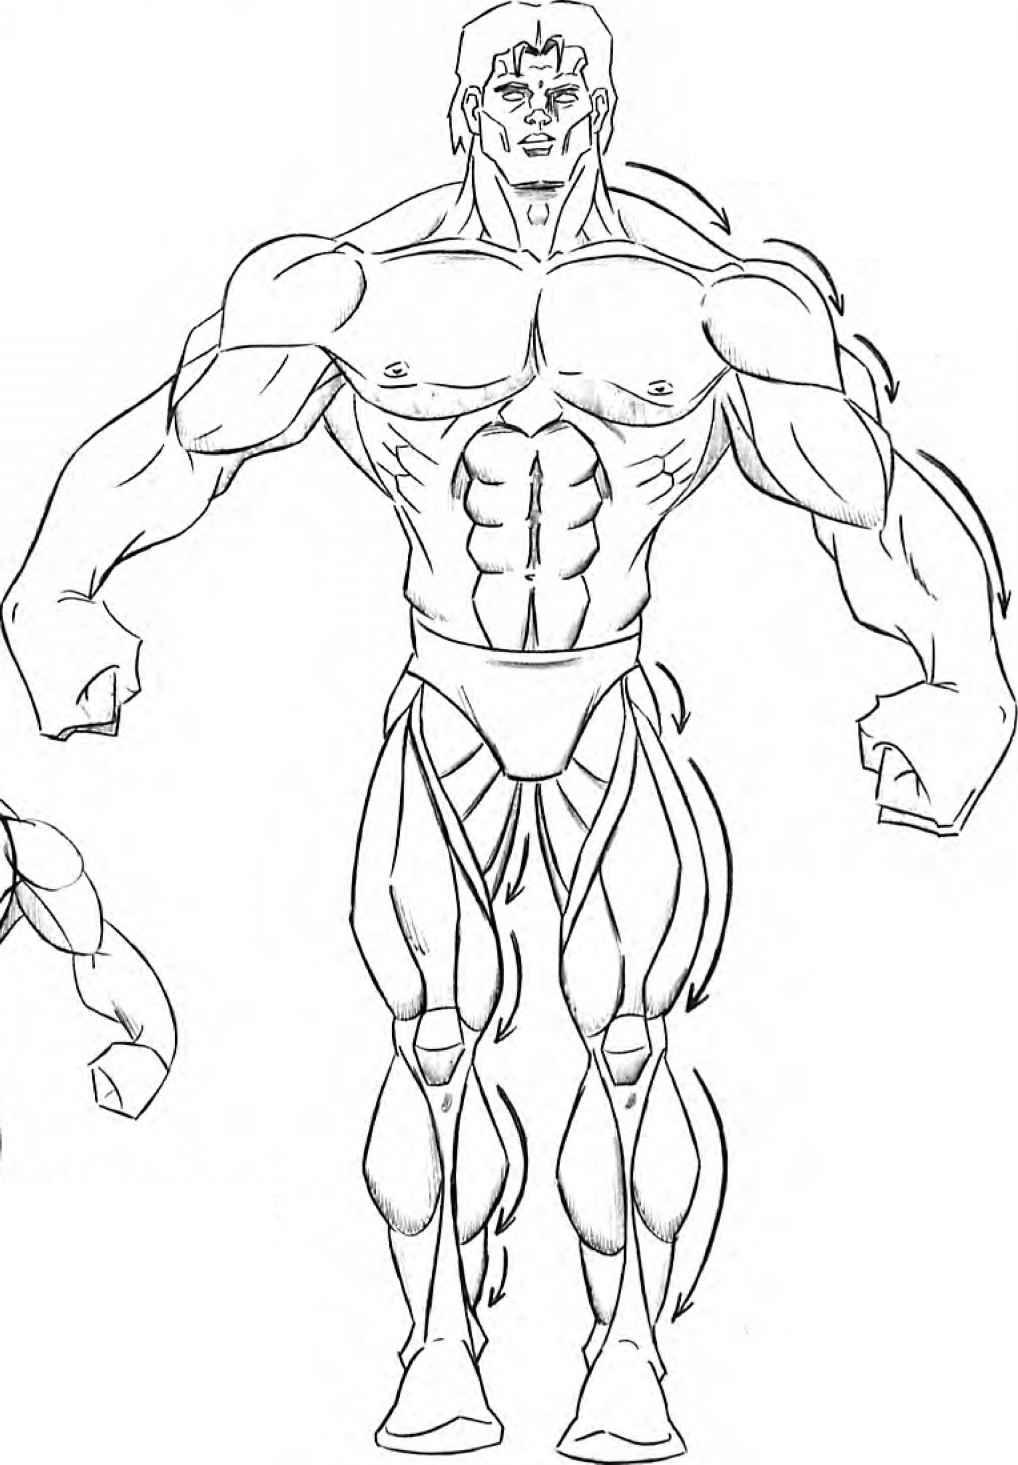 1018x1465 Risultati Immagini Per Drawing Muscles For Comics Drawing Muscle